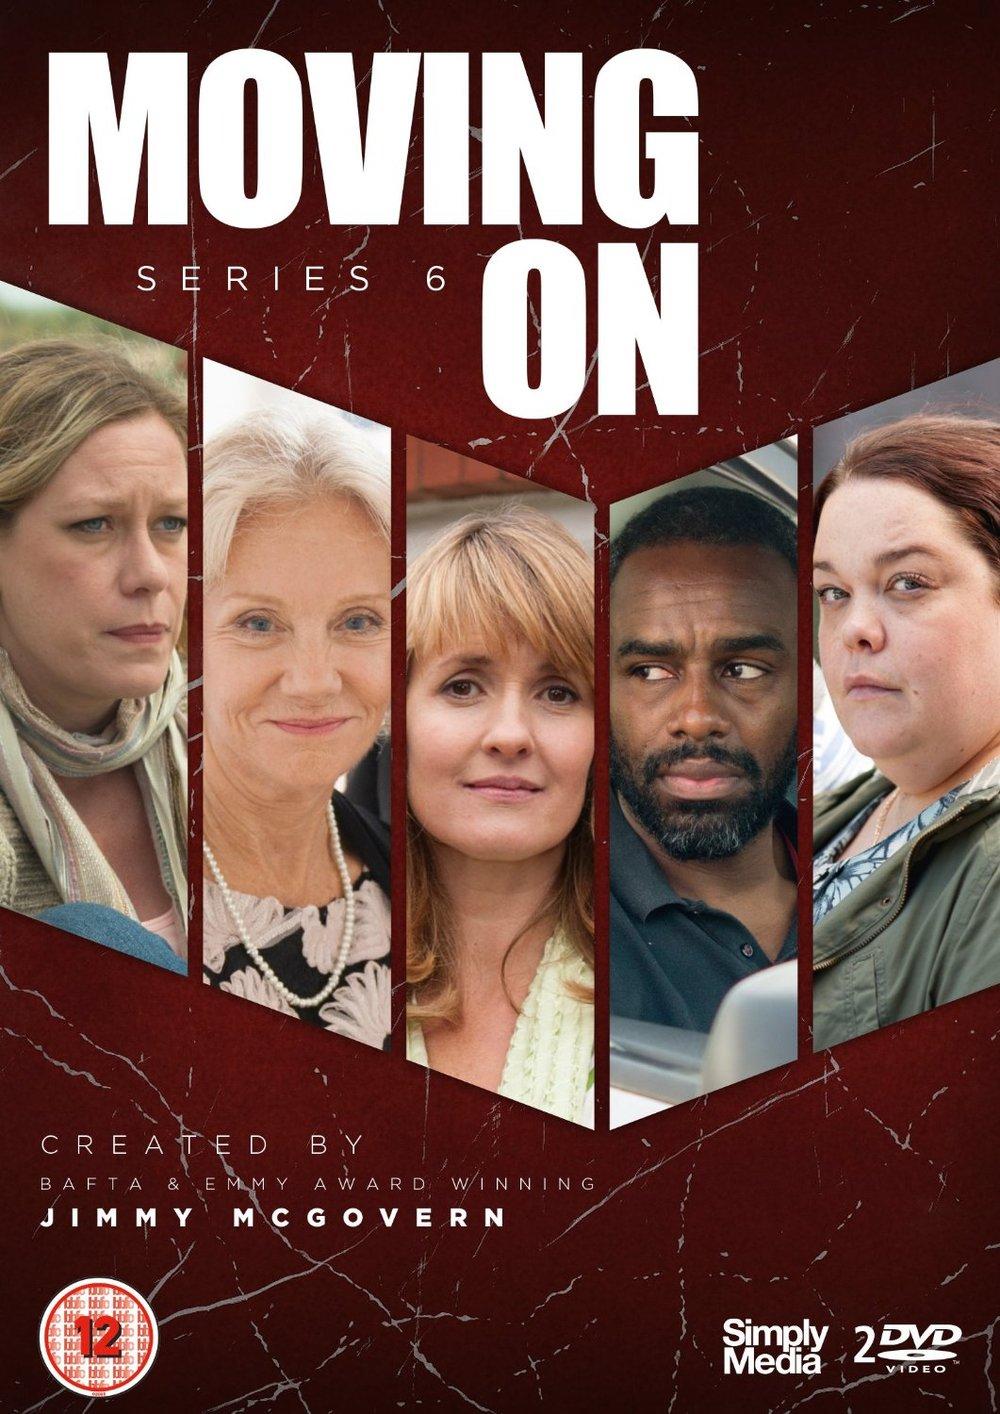 Moving On - Series 6 DVD.jpg